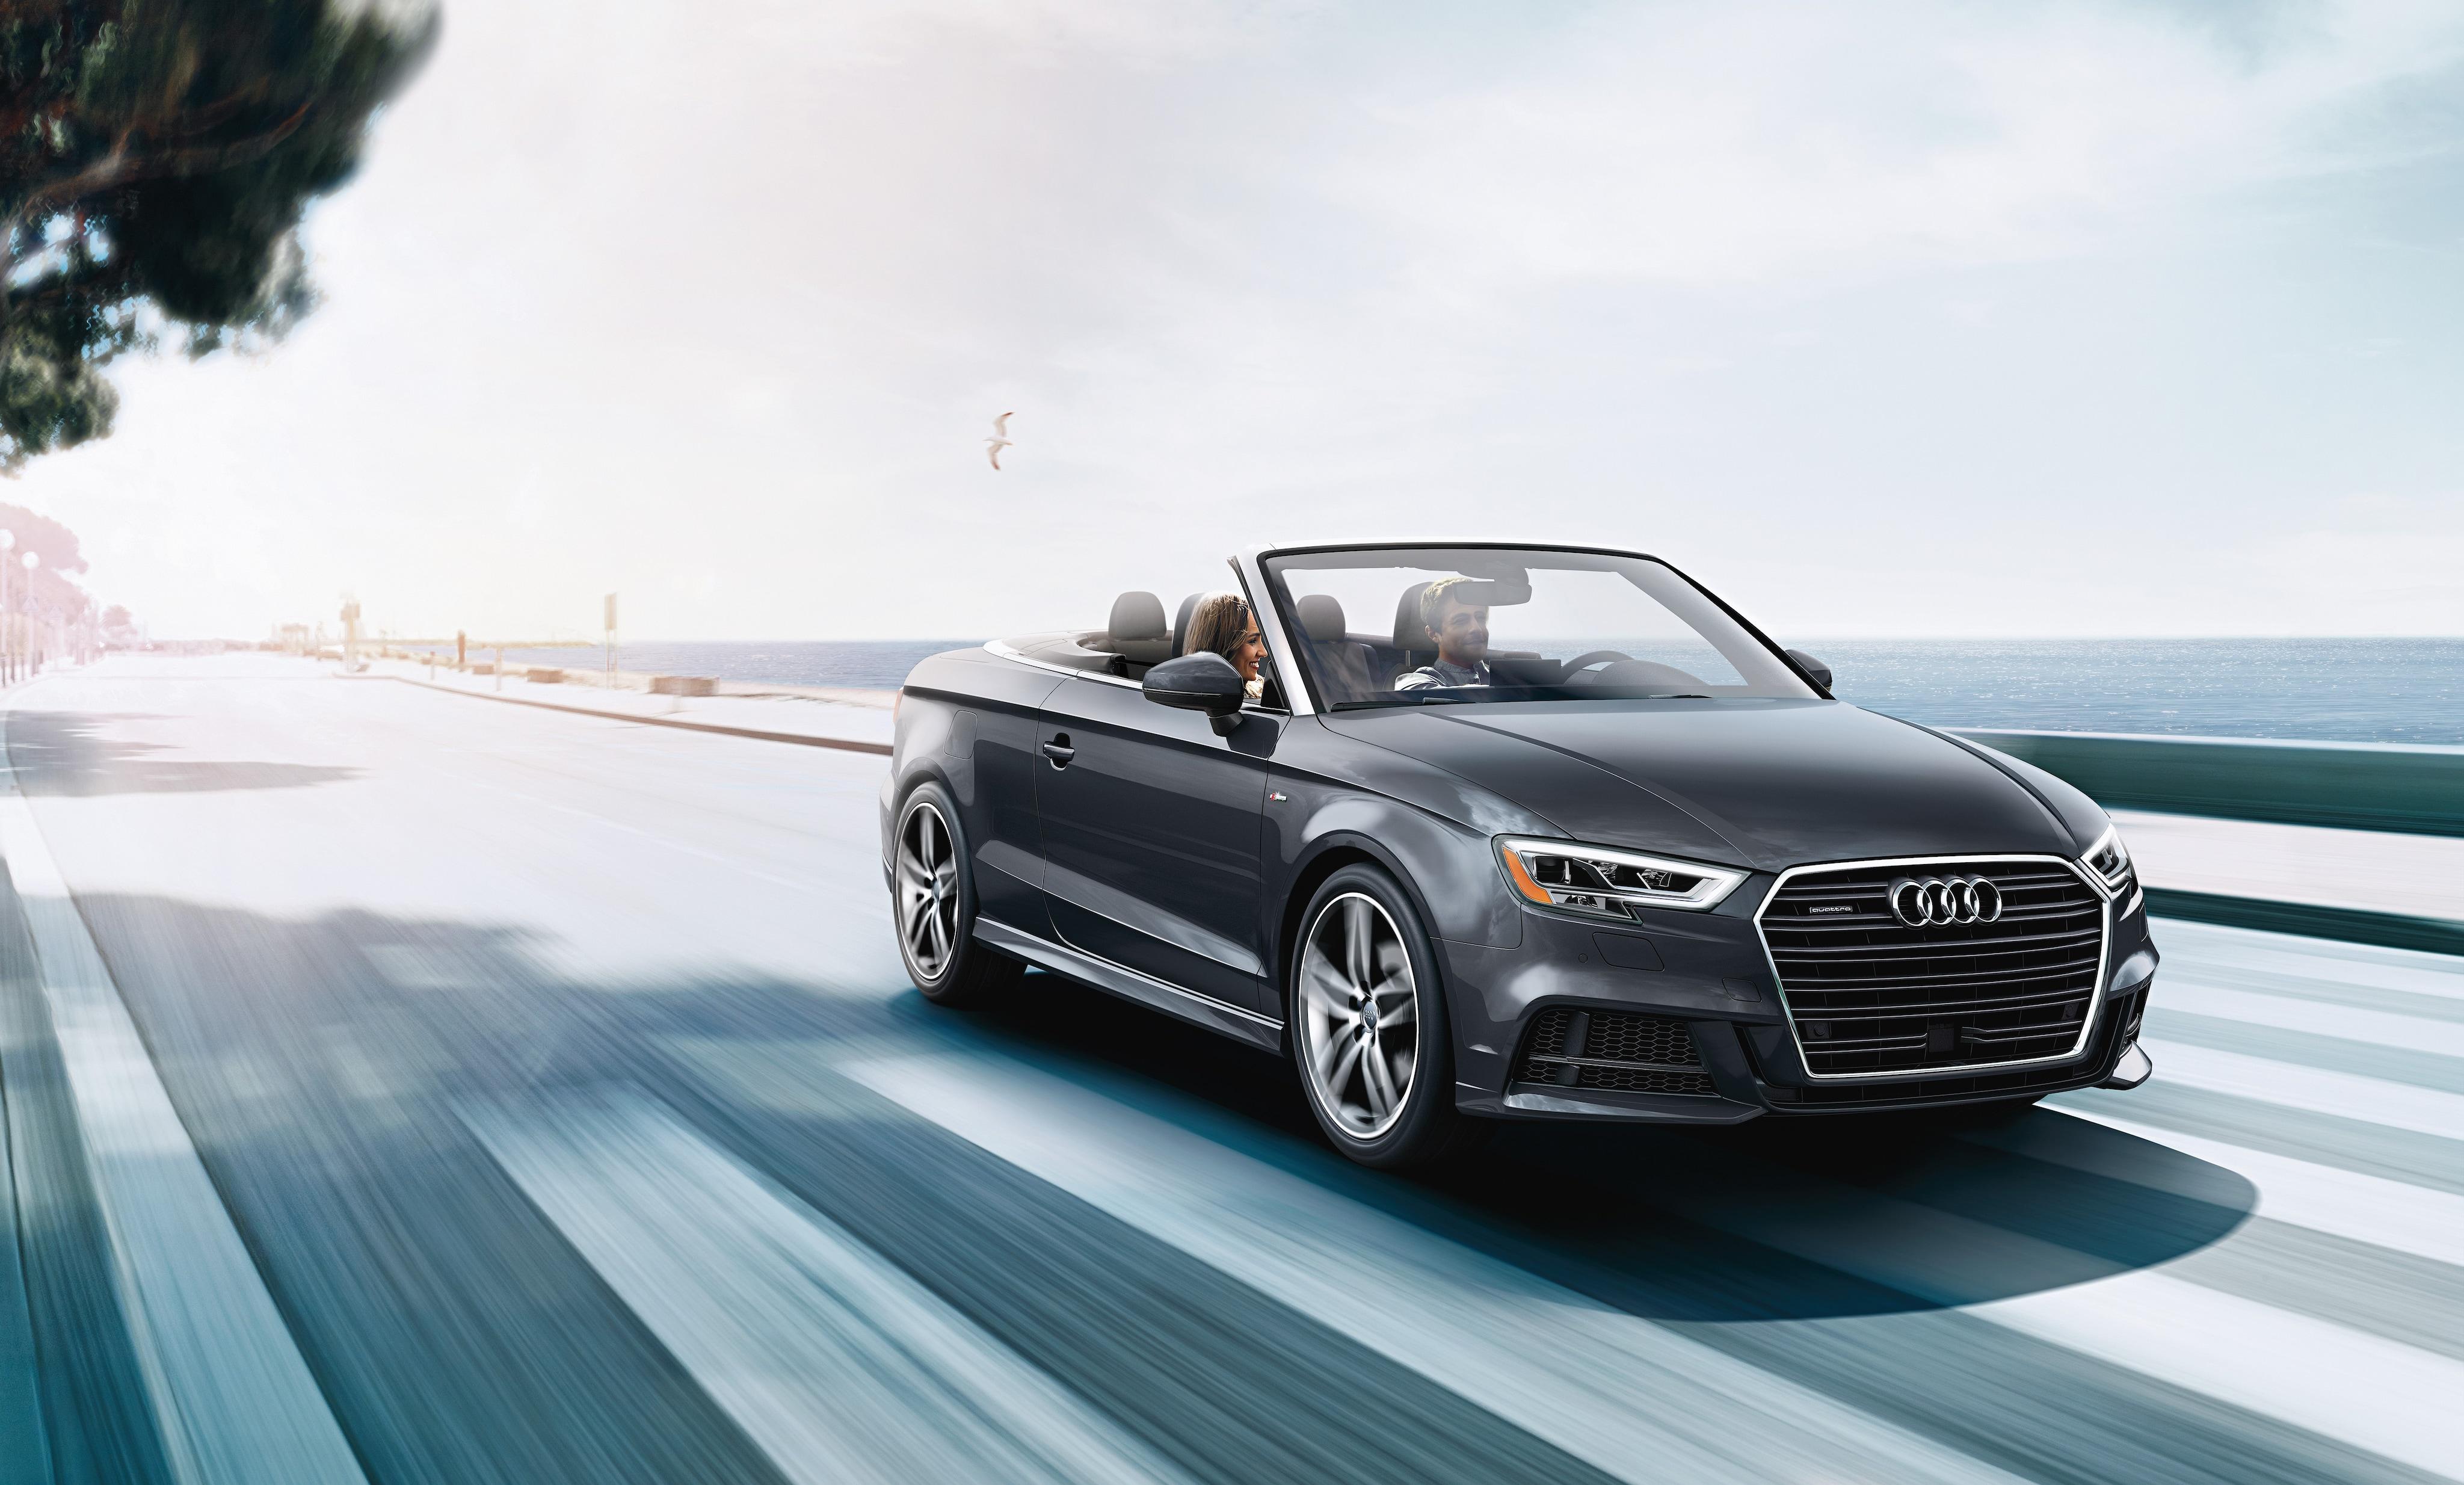 Audi Car Reviews Hardeeville SC Audi Hilton Head - Audi car reviews